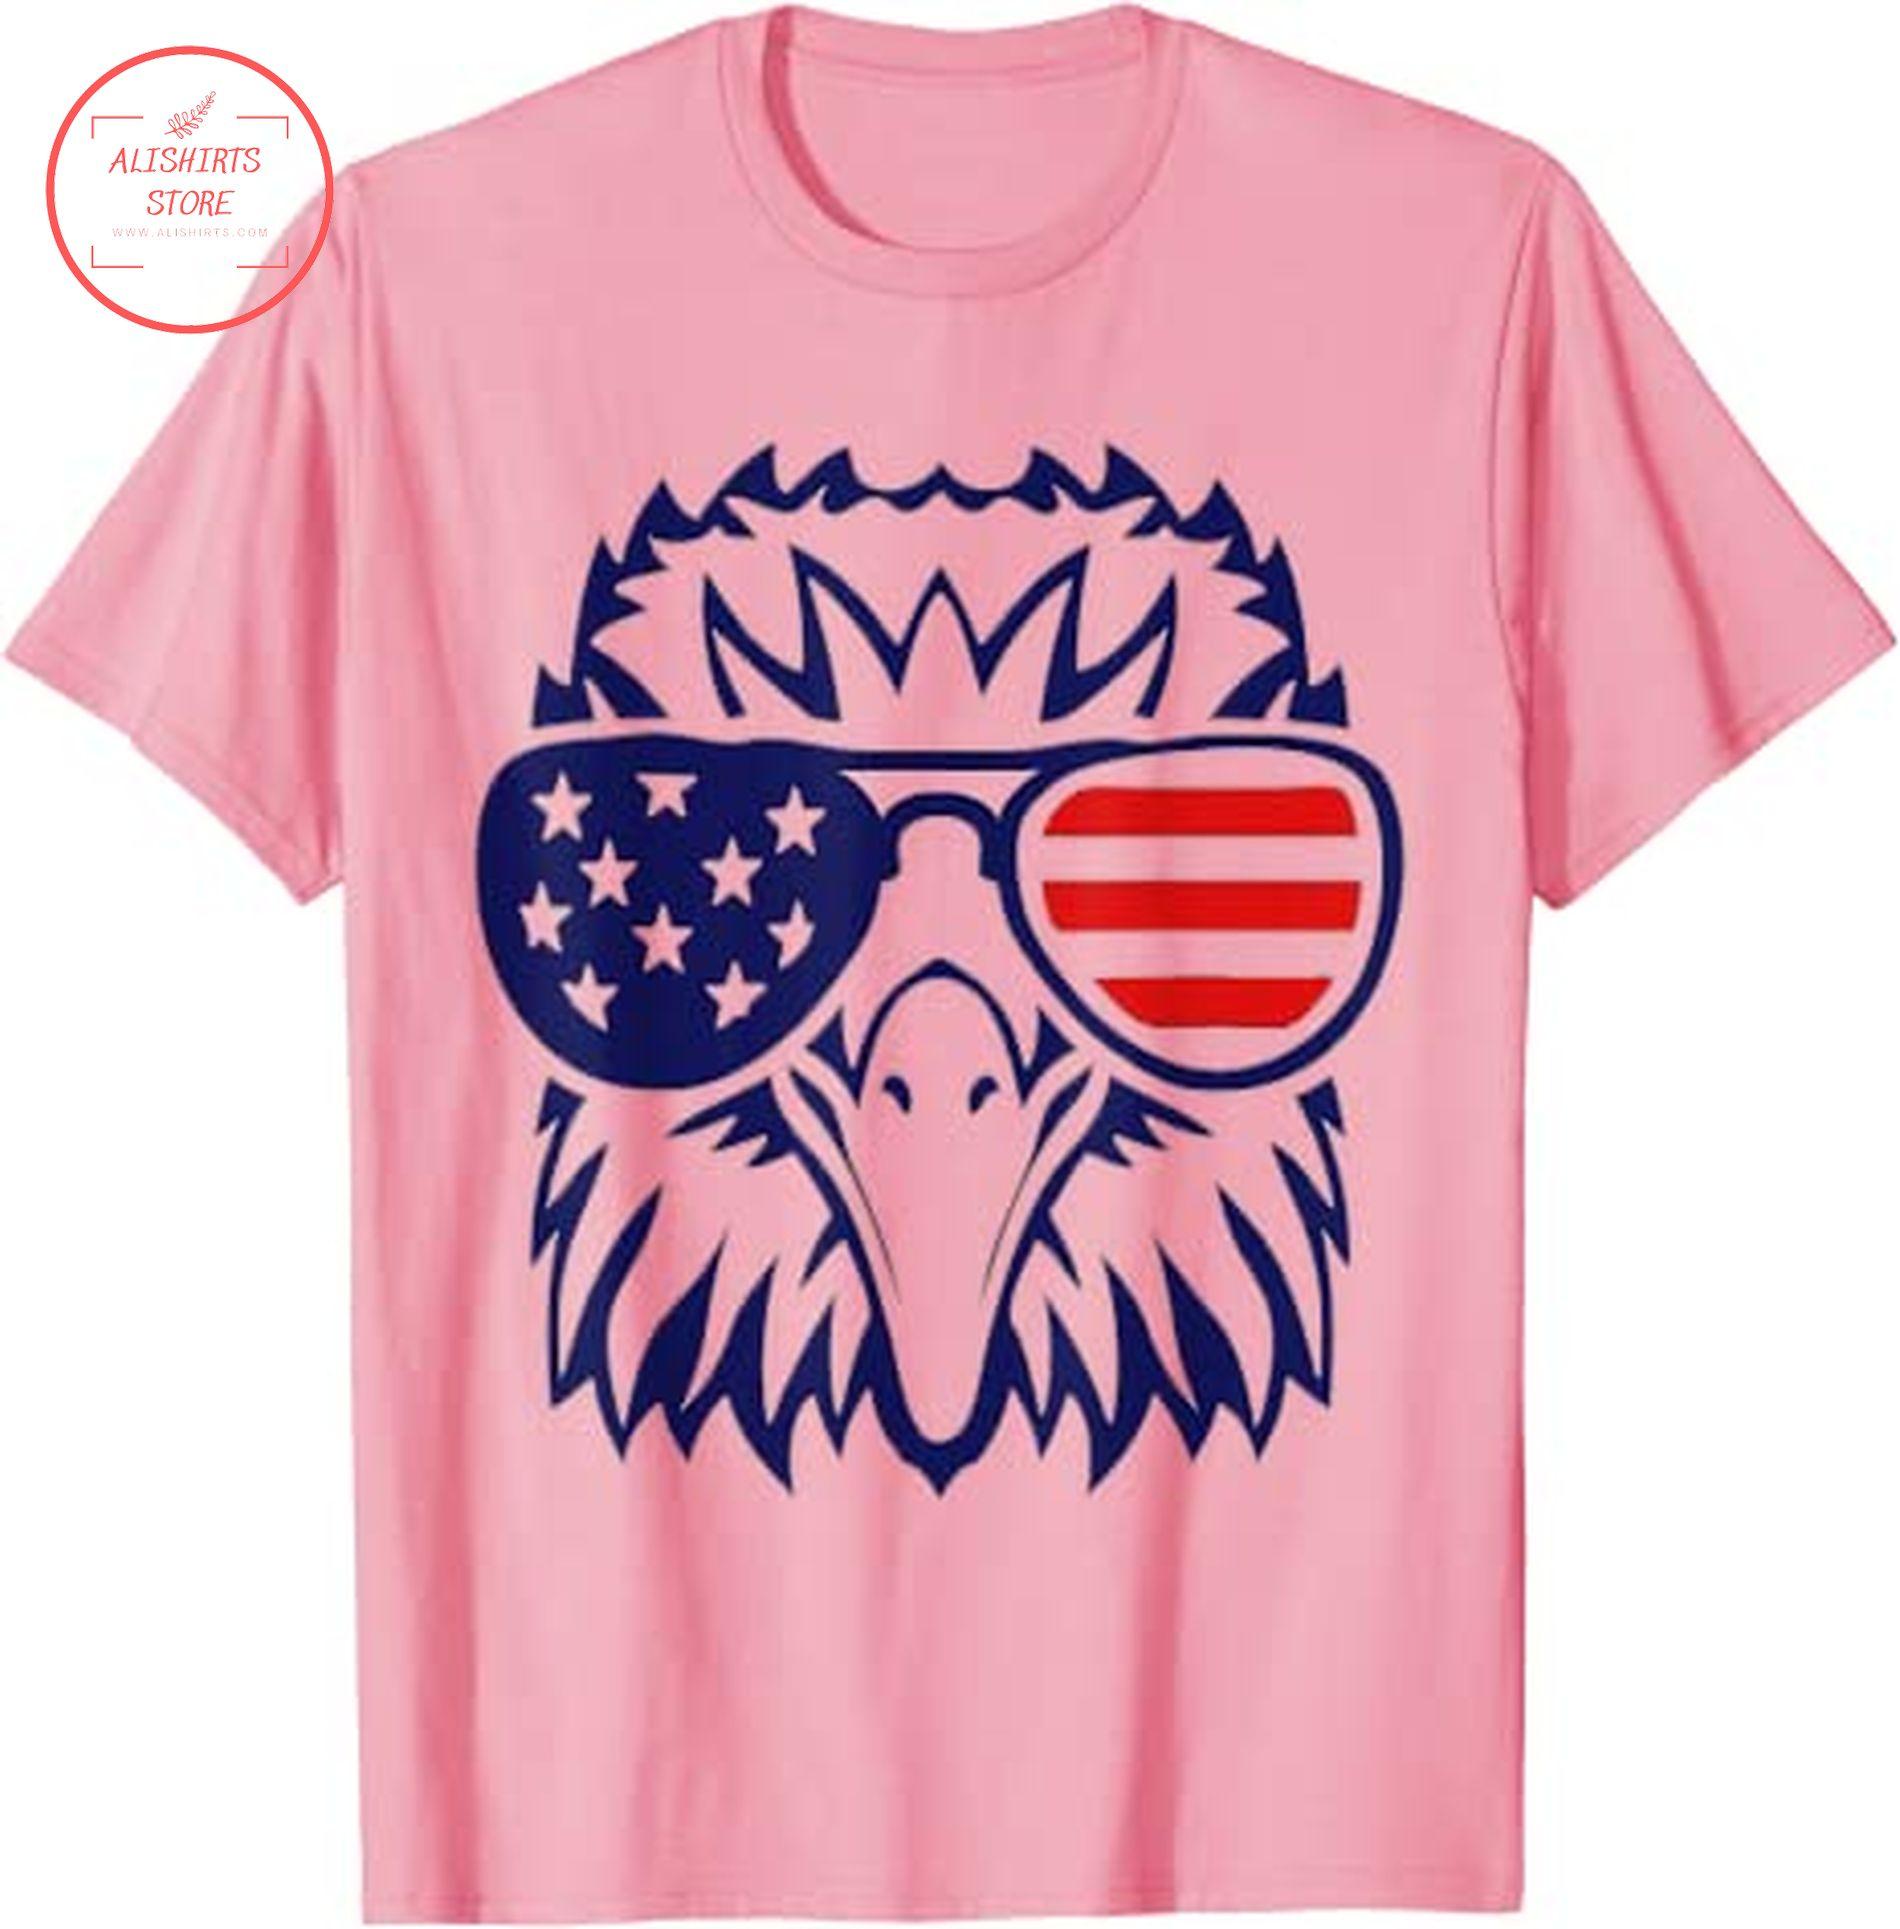 4th of July bald eagle shirts